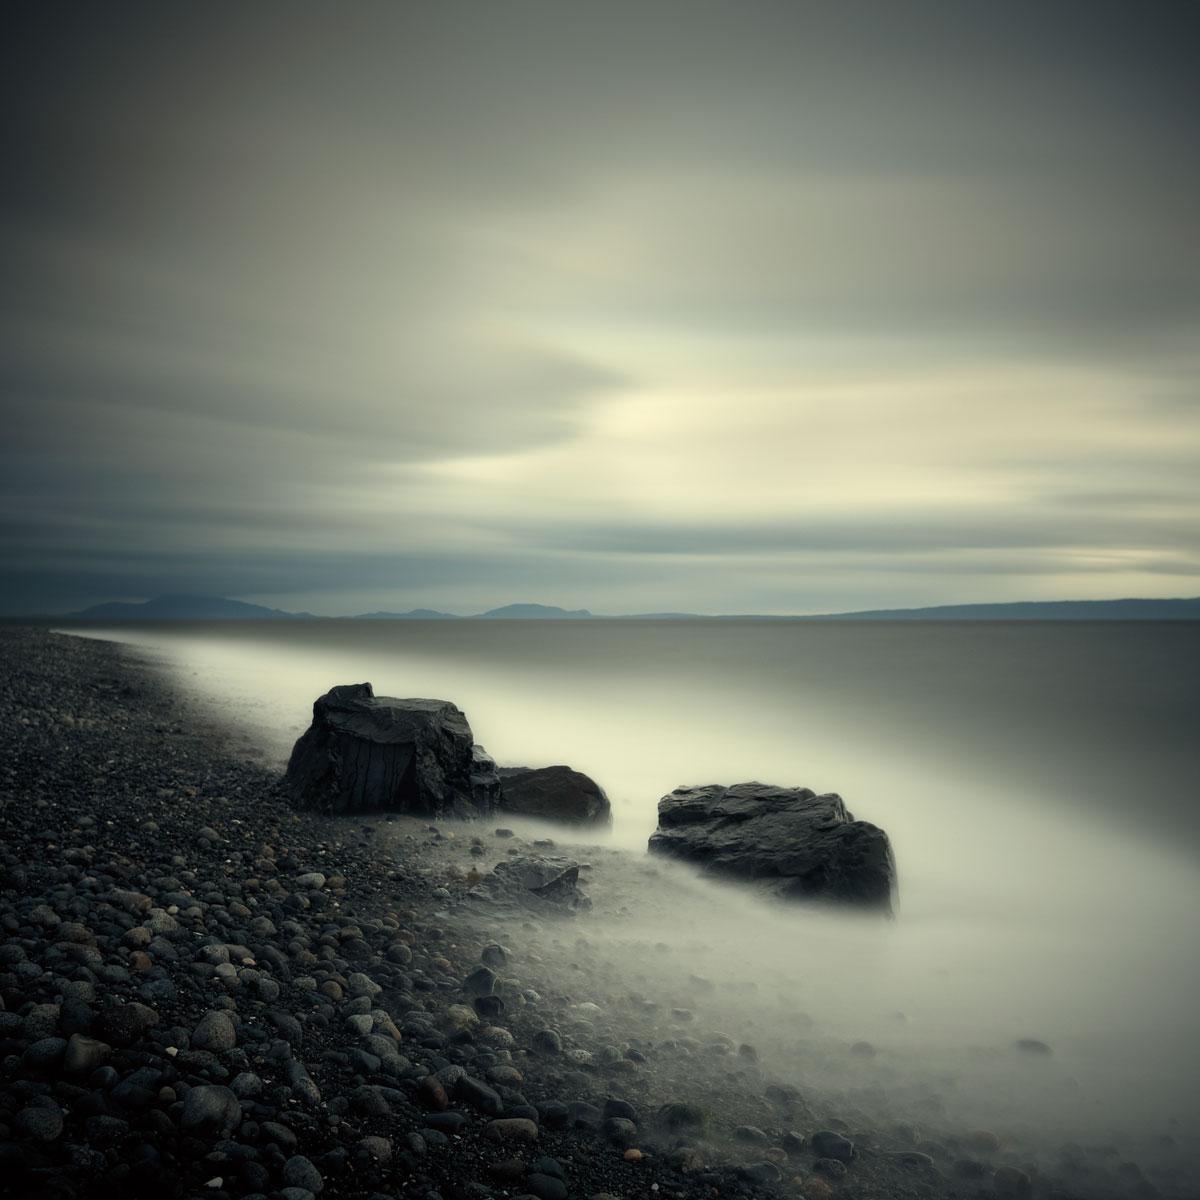 Salish photo by David Ellingsen